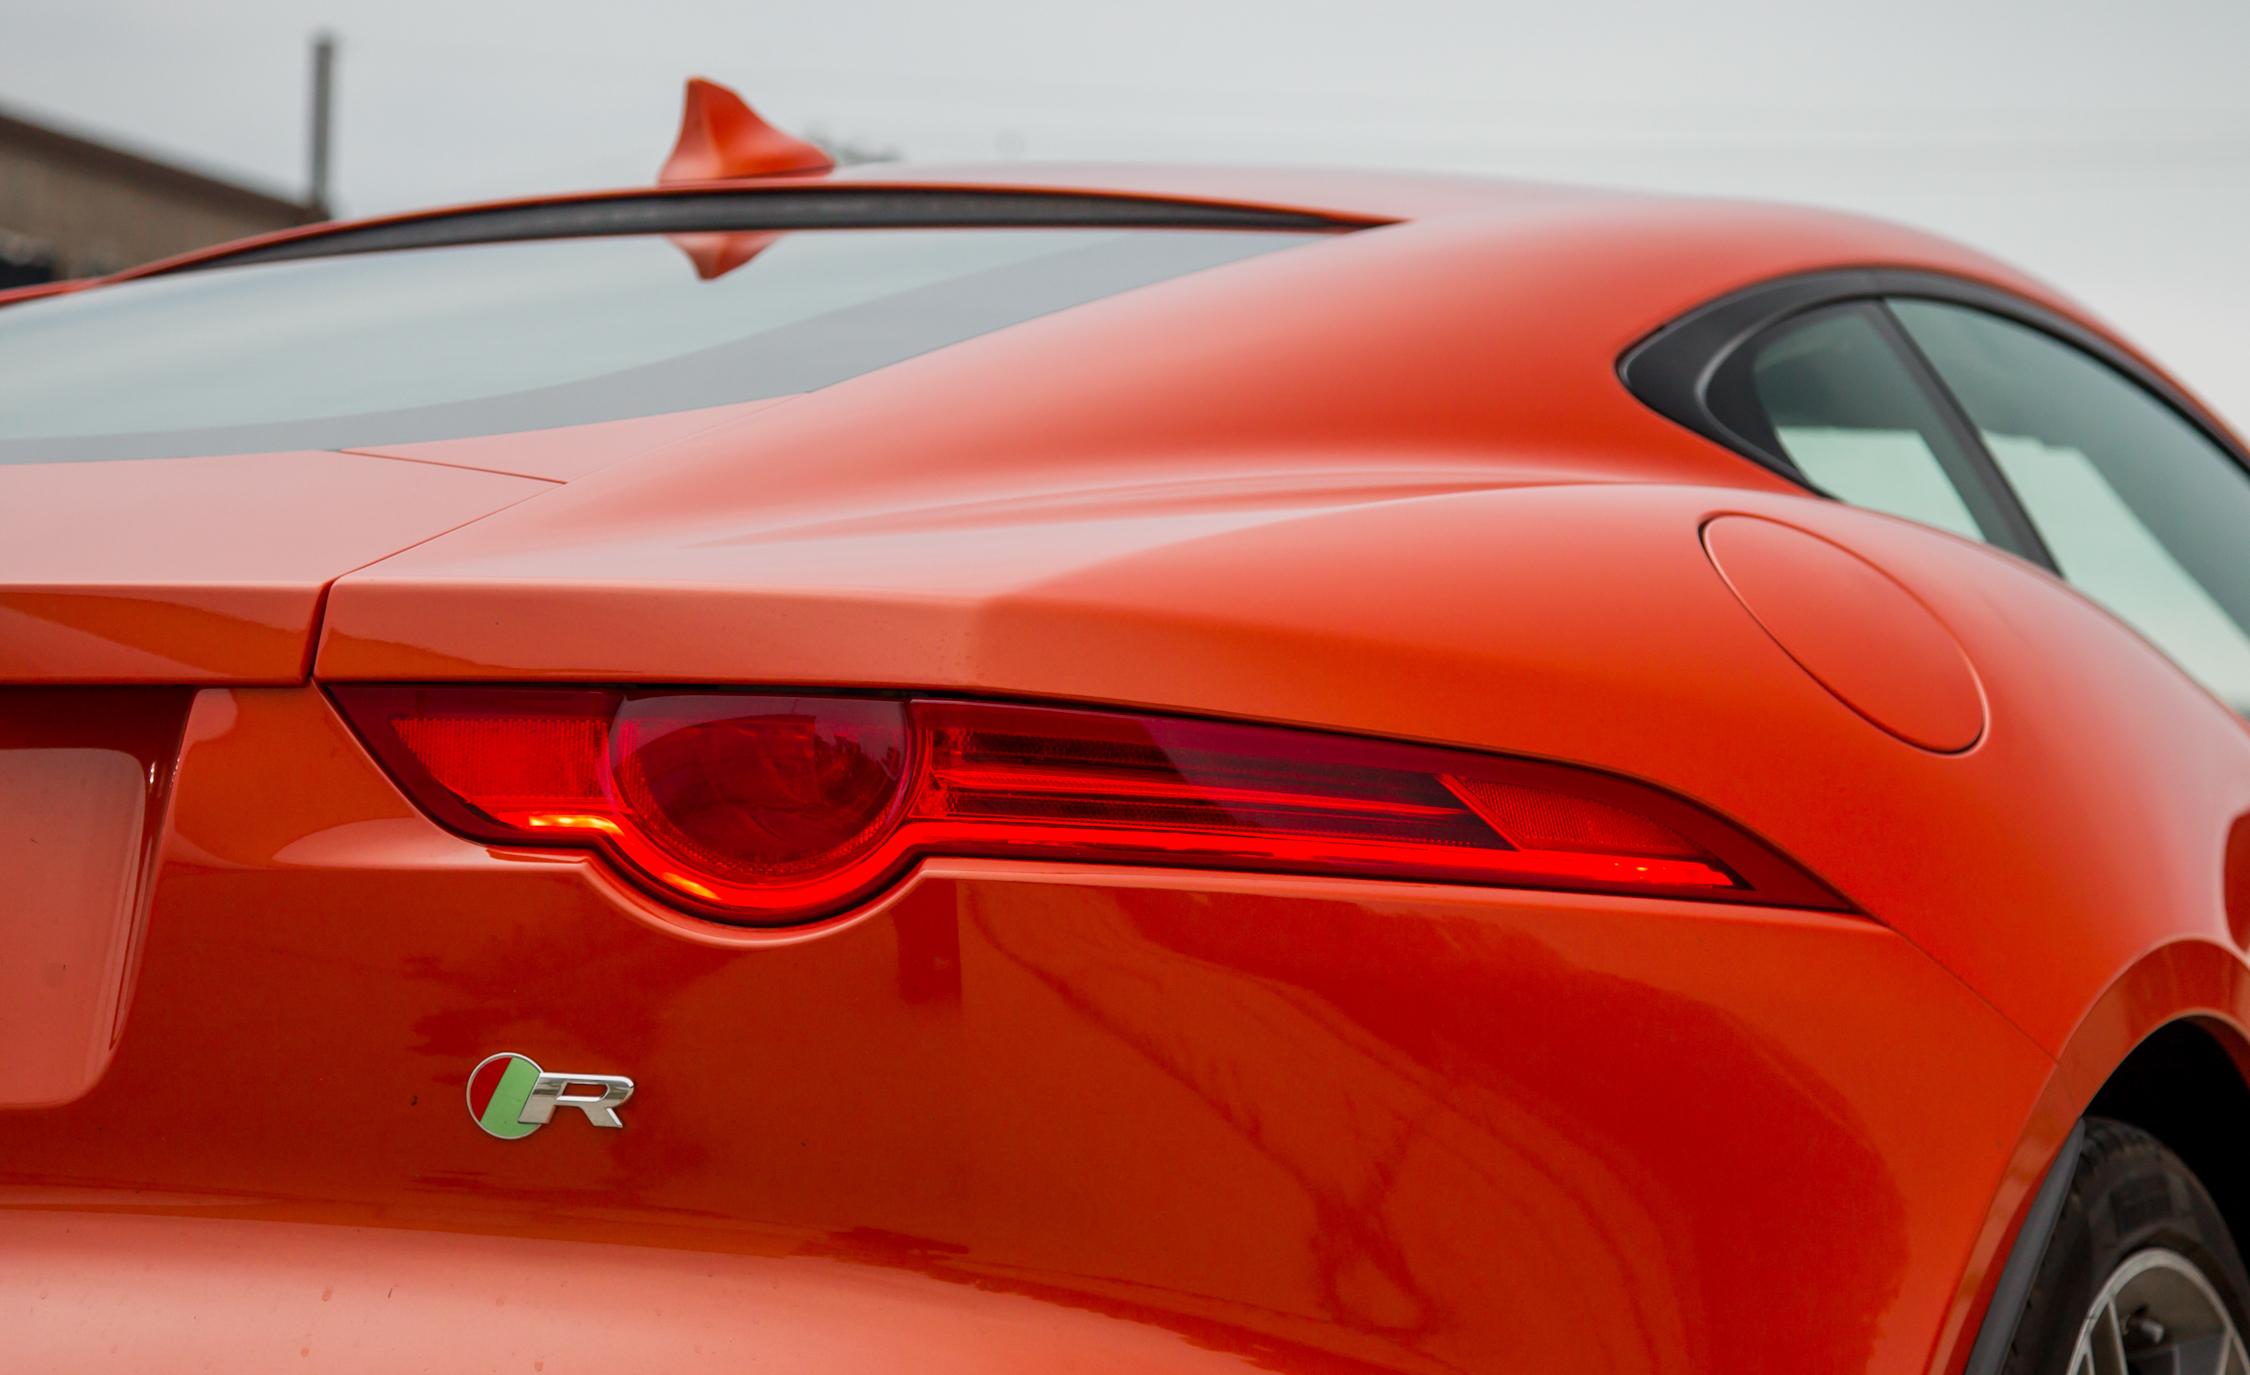 2015 Jaguar F-type R Coupe Exterior Taillight